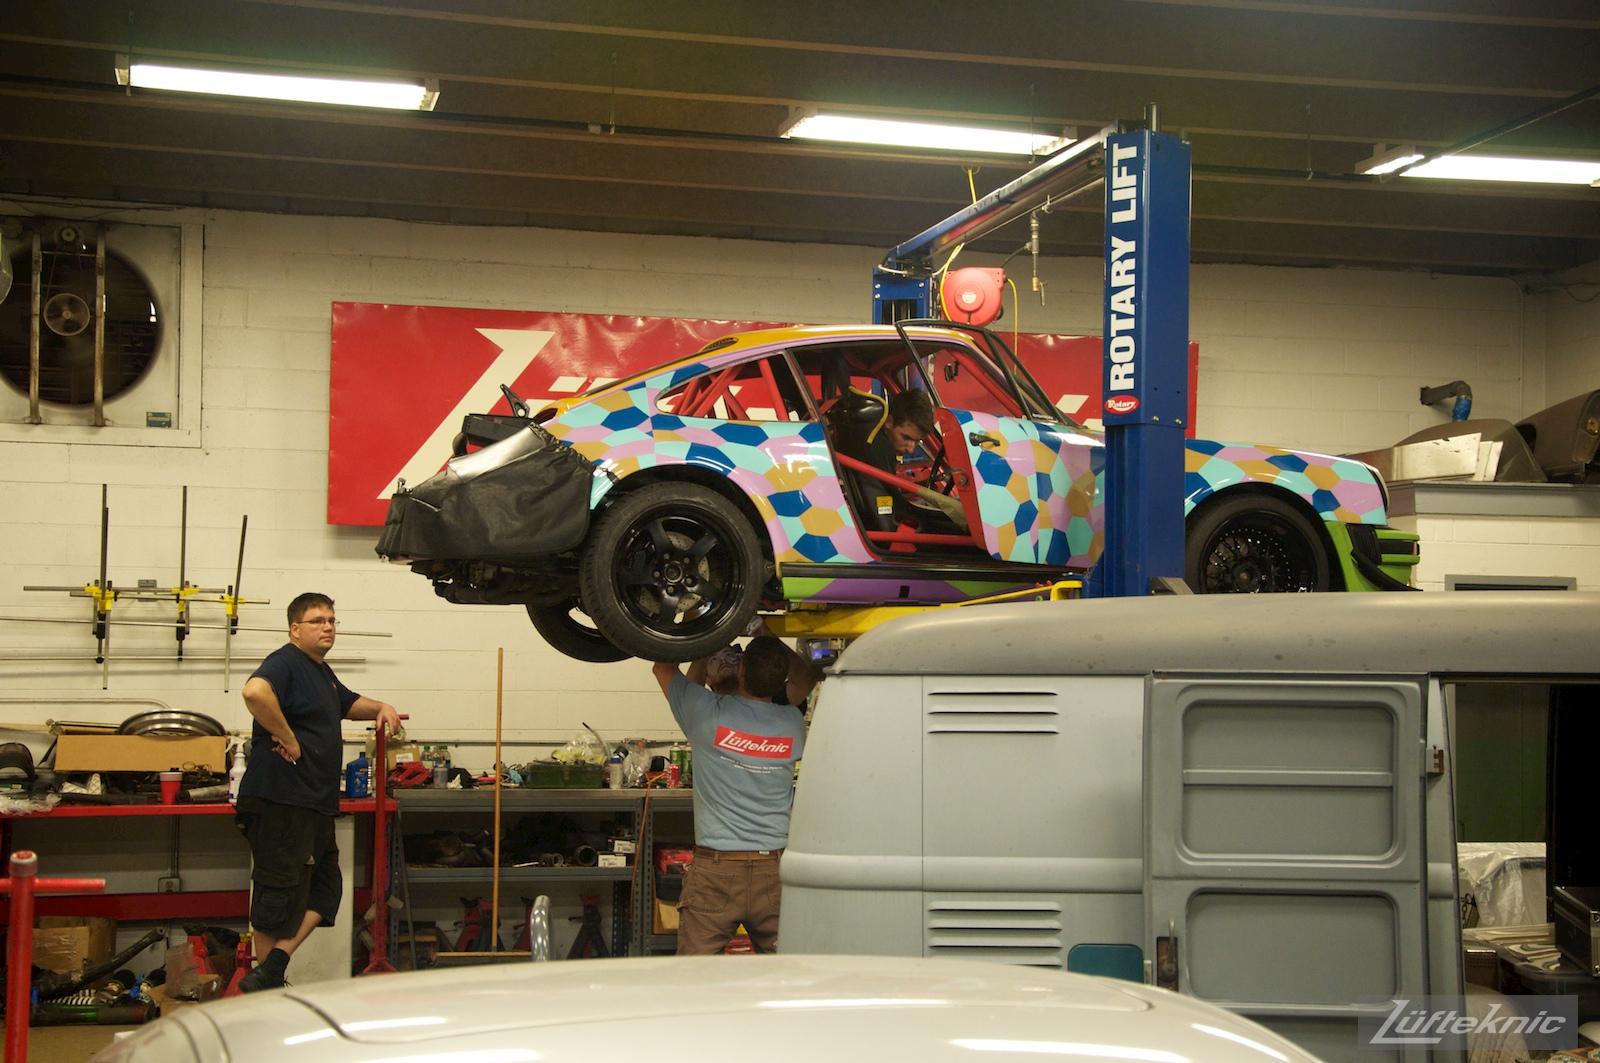 Late night rushing to finish the Lüfteknic #projectstuka Porsche 930 Turbo